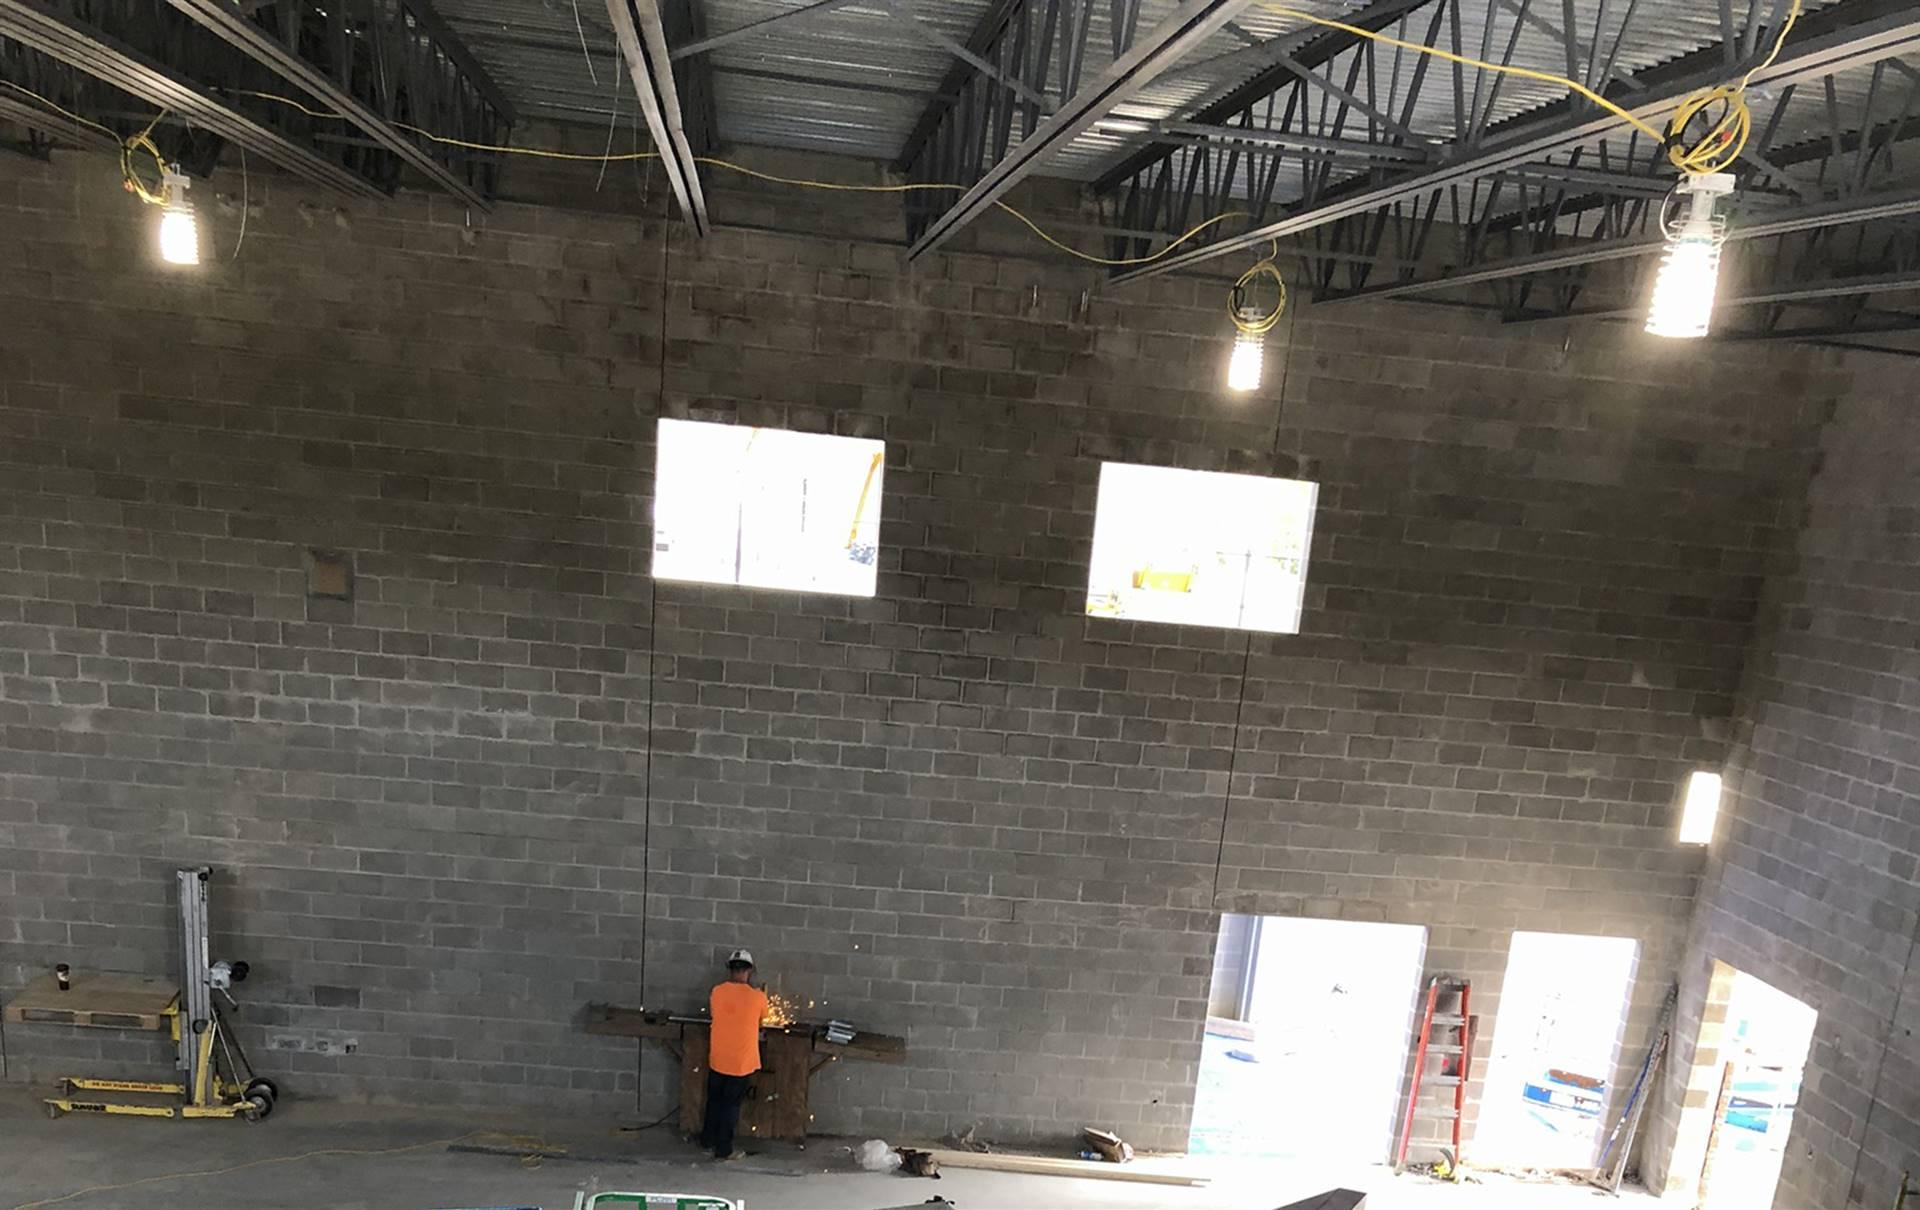 Progress on the new Greensview Elementary School gymnasium